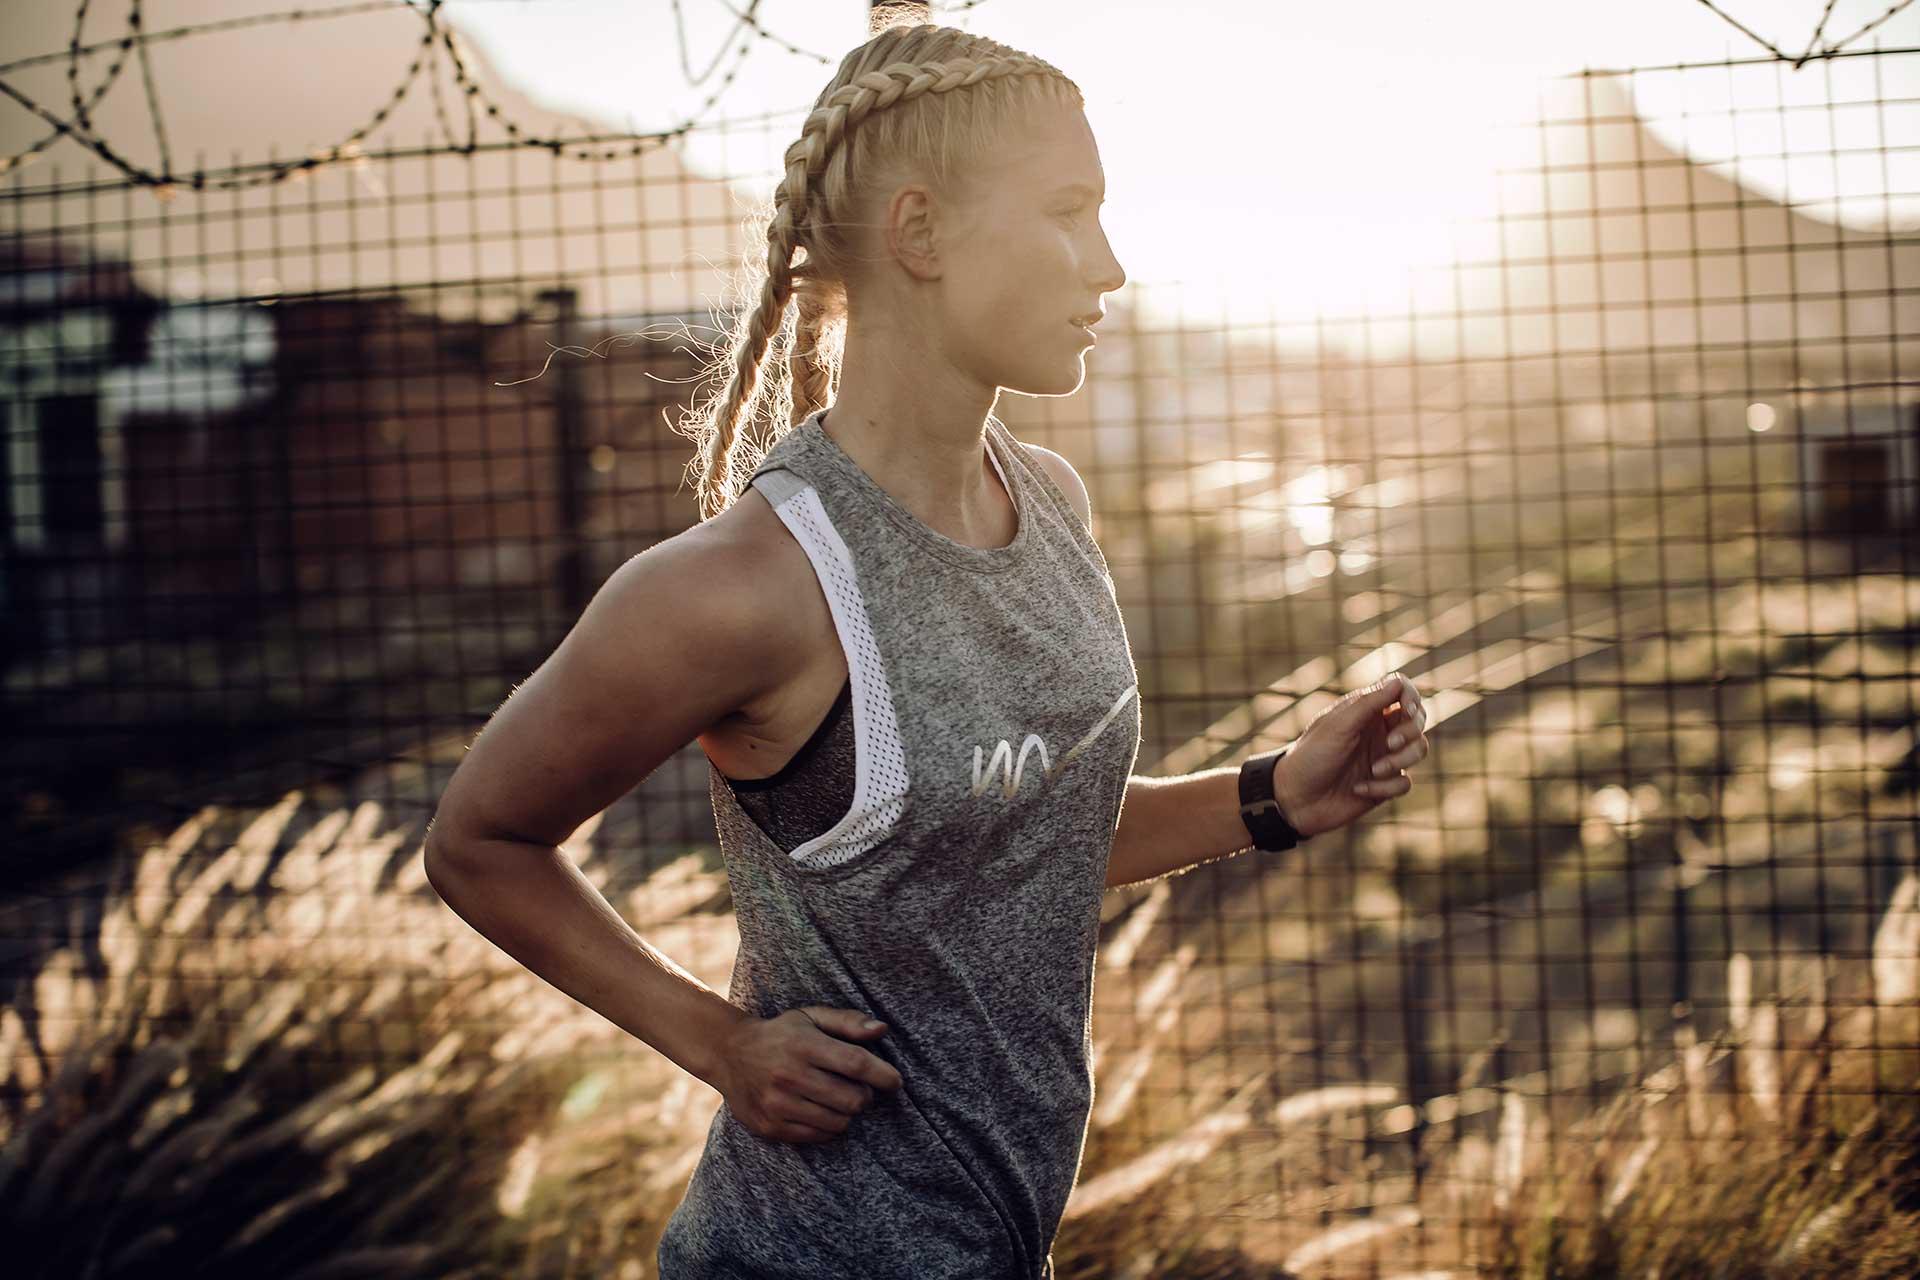 Gegenlicht Sonnenuntergang Fotograf Running Laufsport Training Fitness USA New York